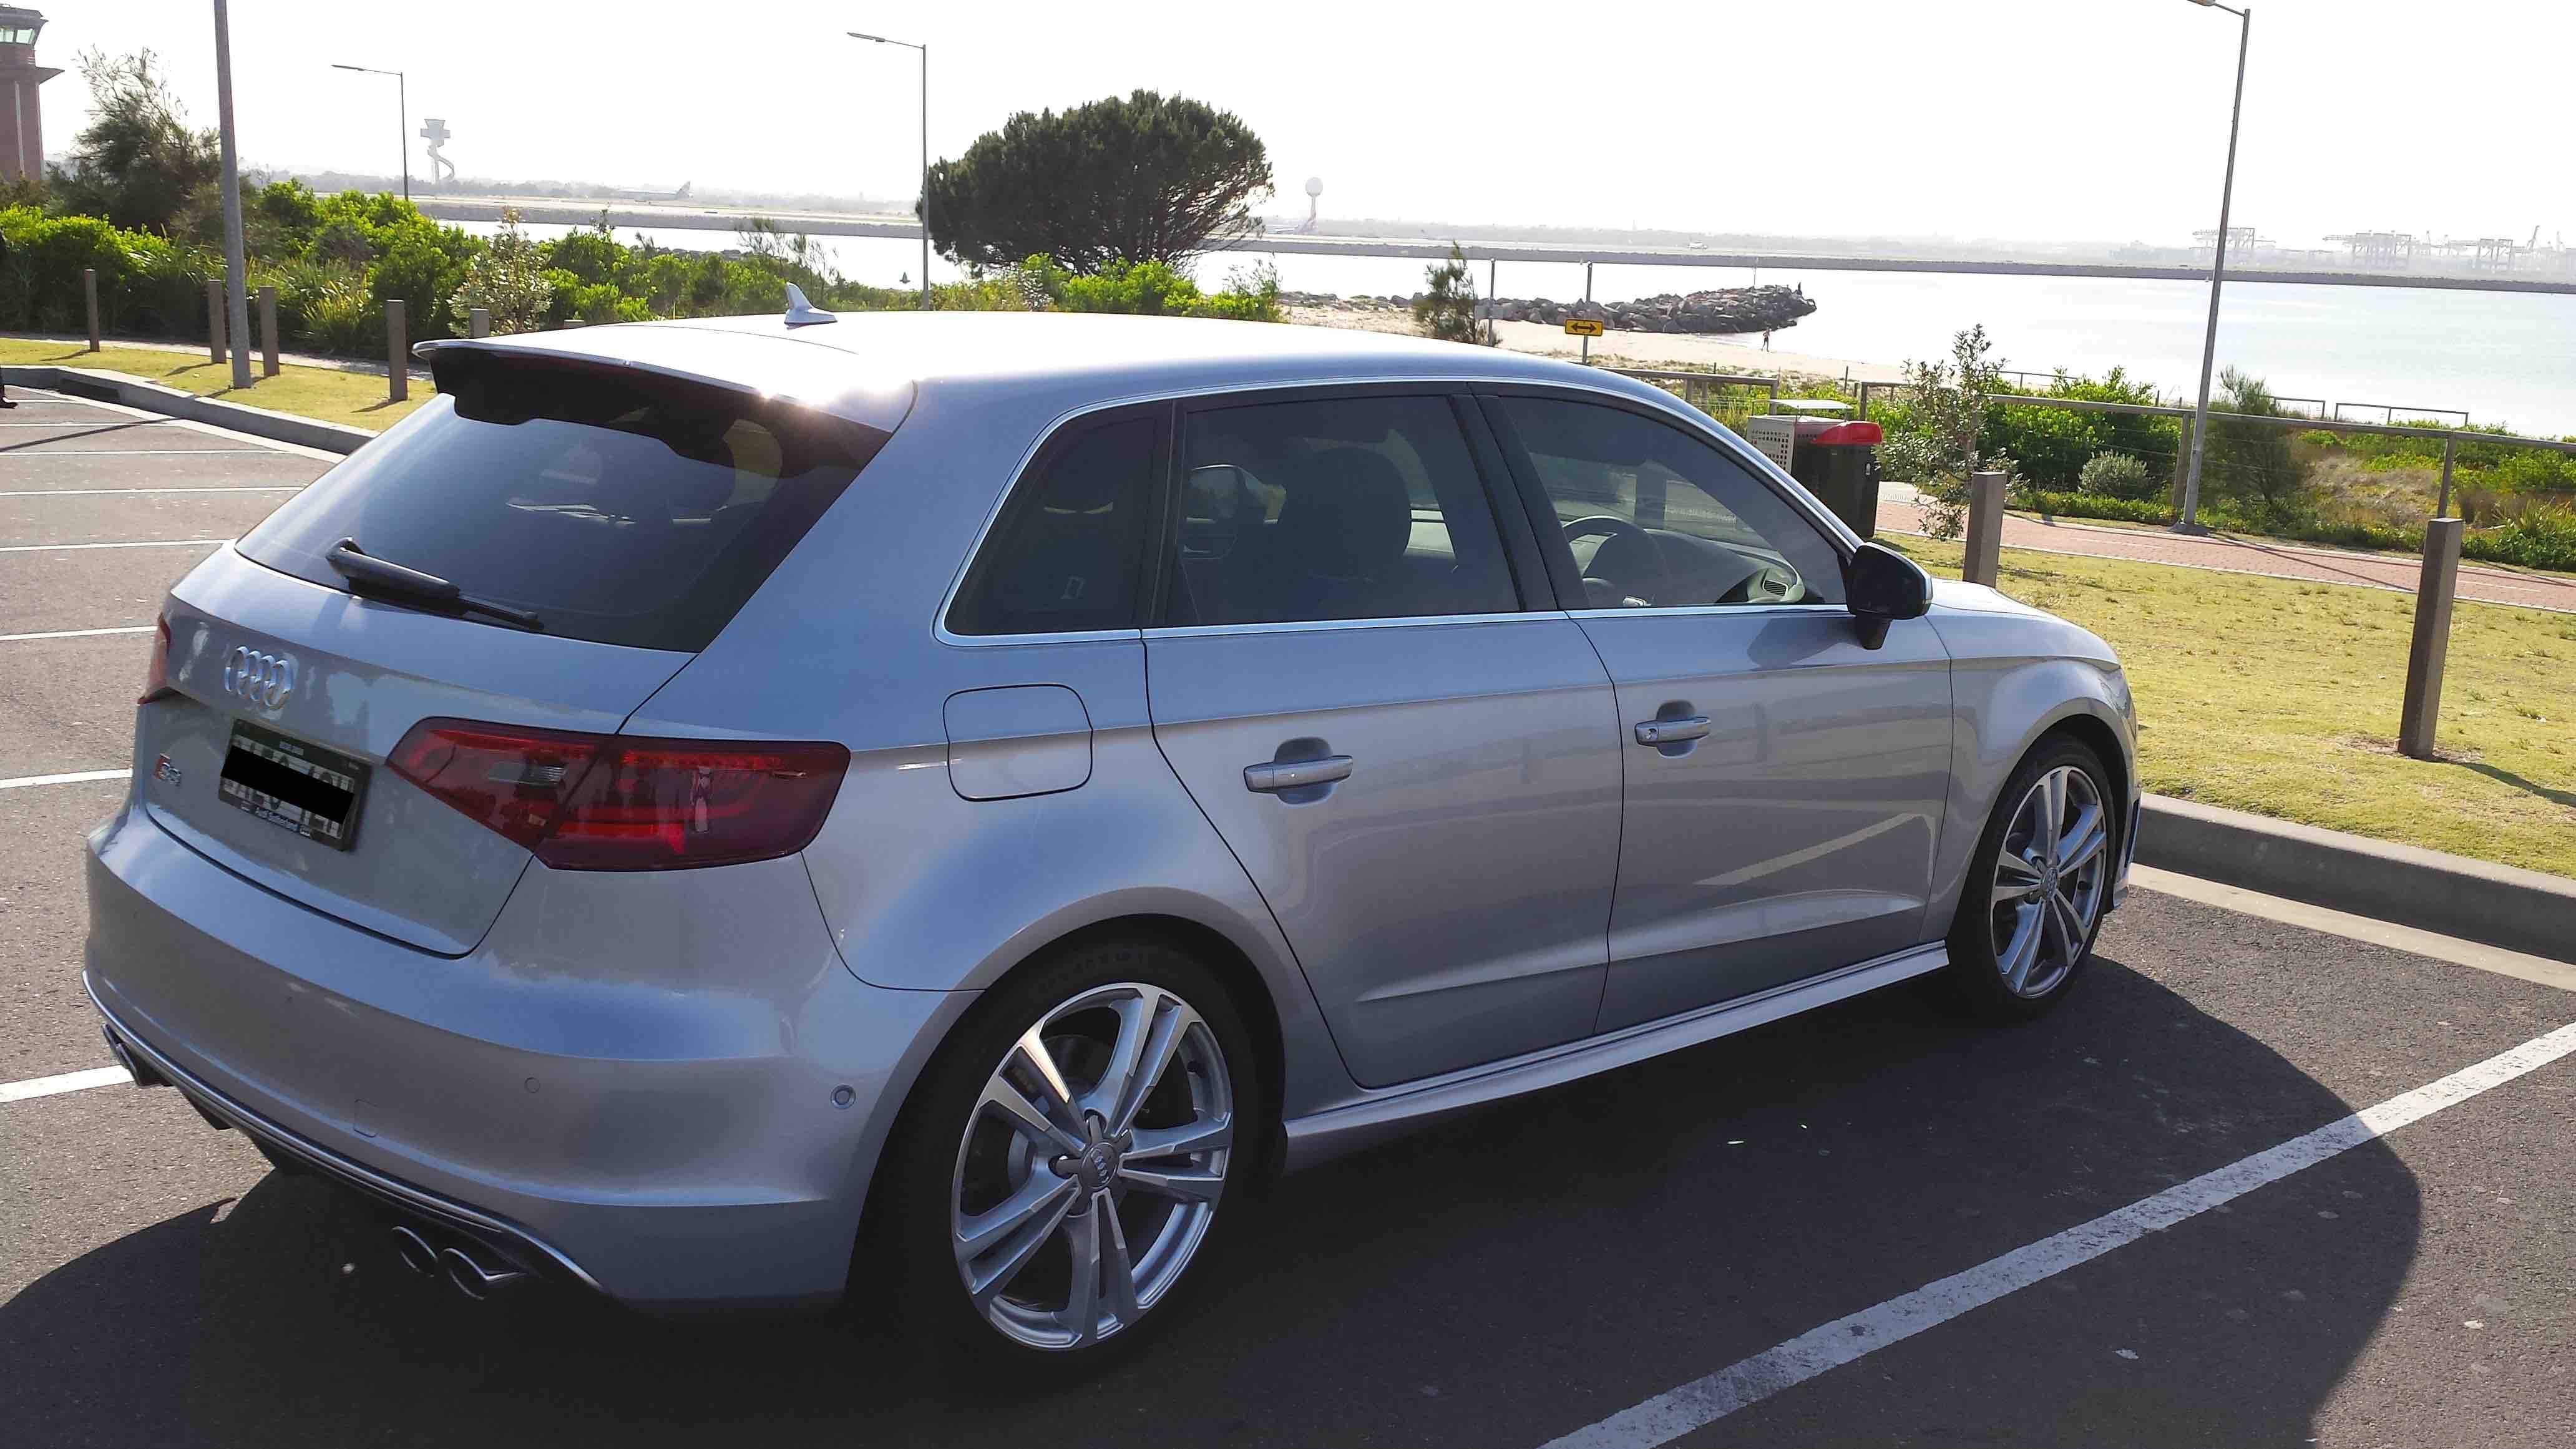 Pic request: Florett silver | Audi-Sport.net